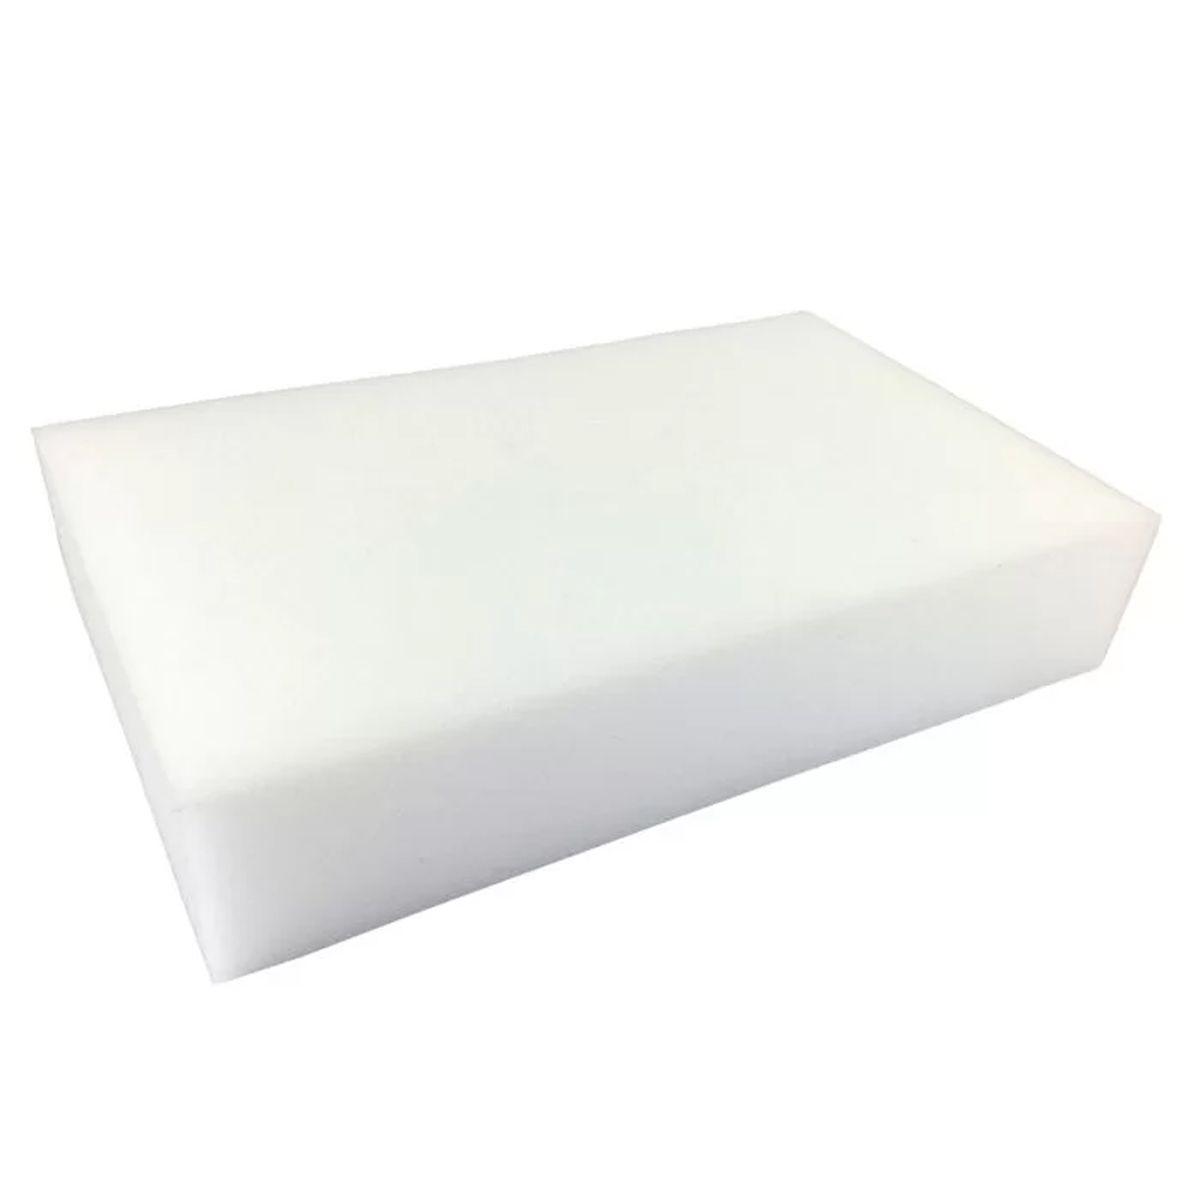 Esponja de Melamina Para Limpeza De Couro e Plásticos Mandala